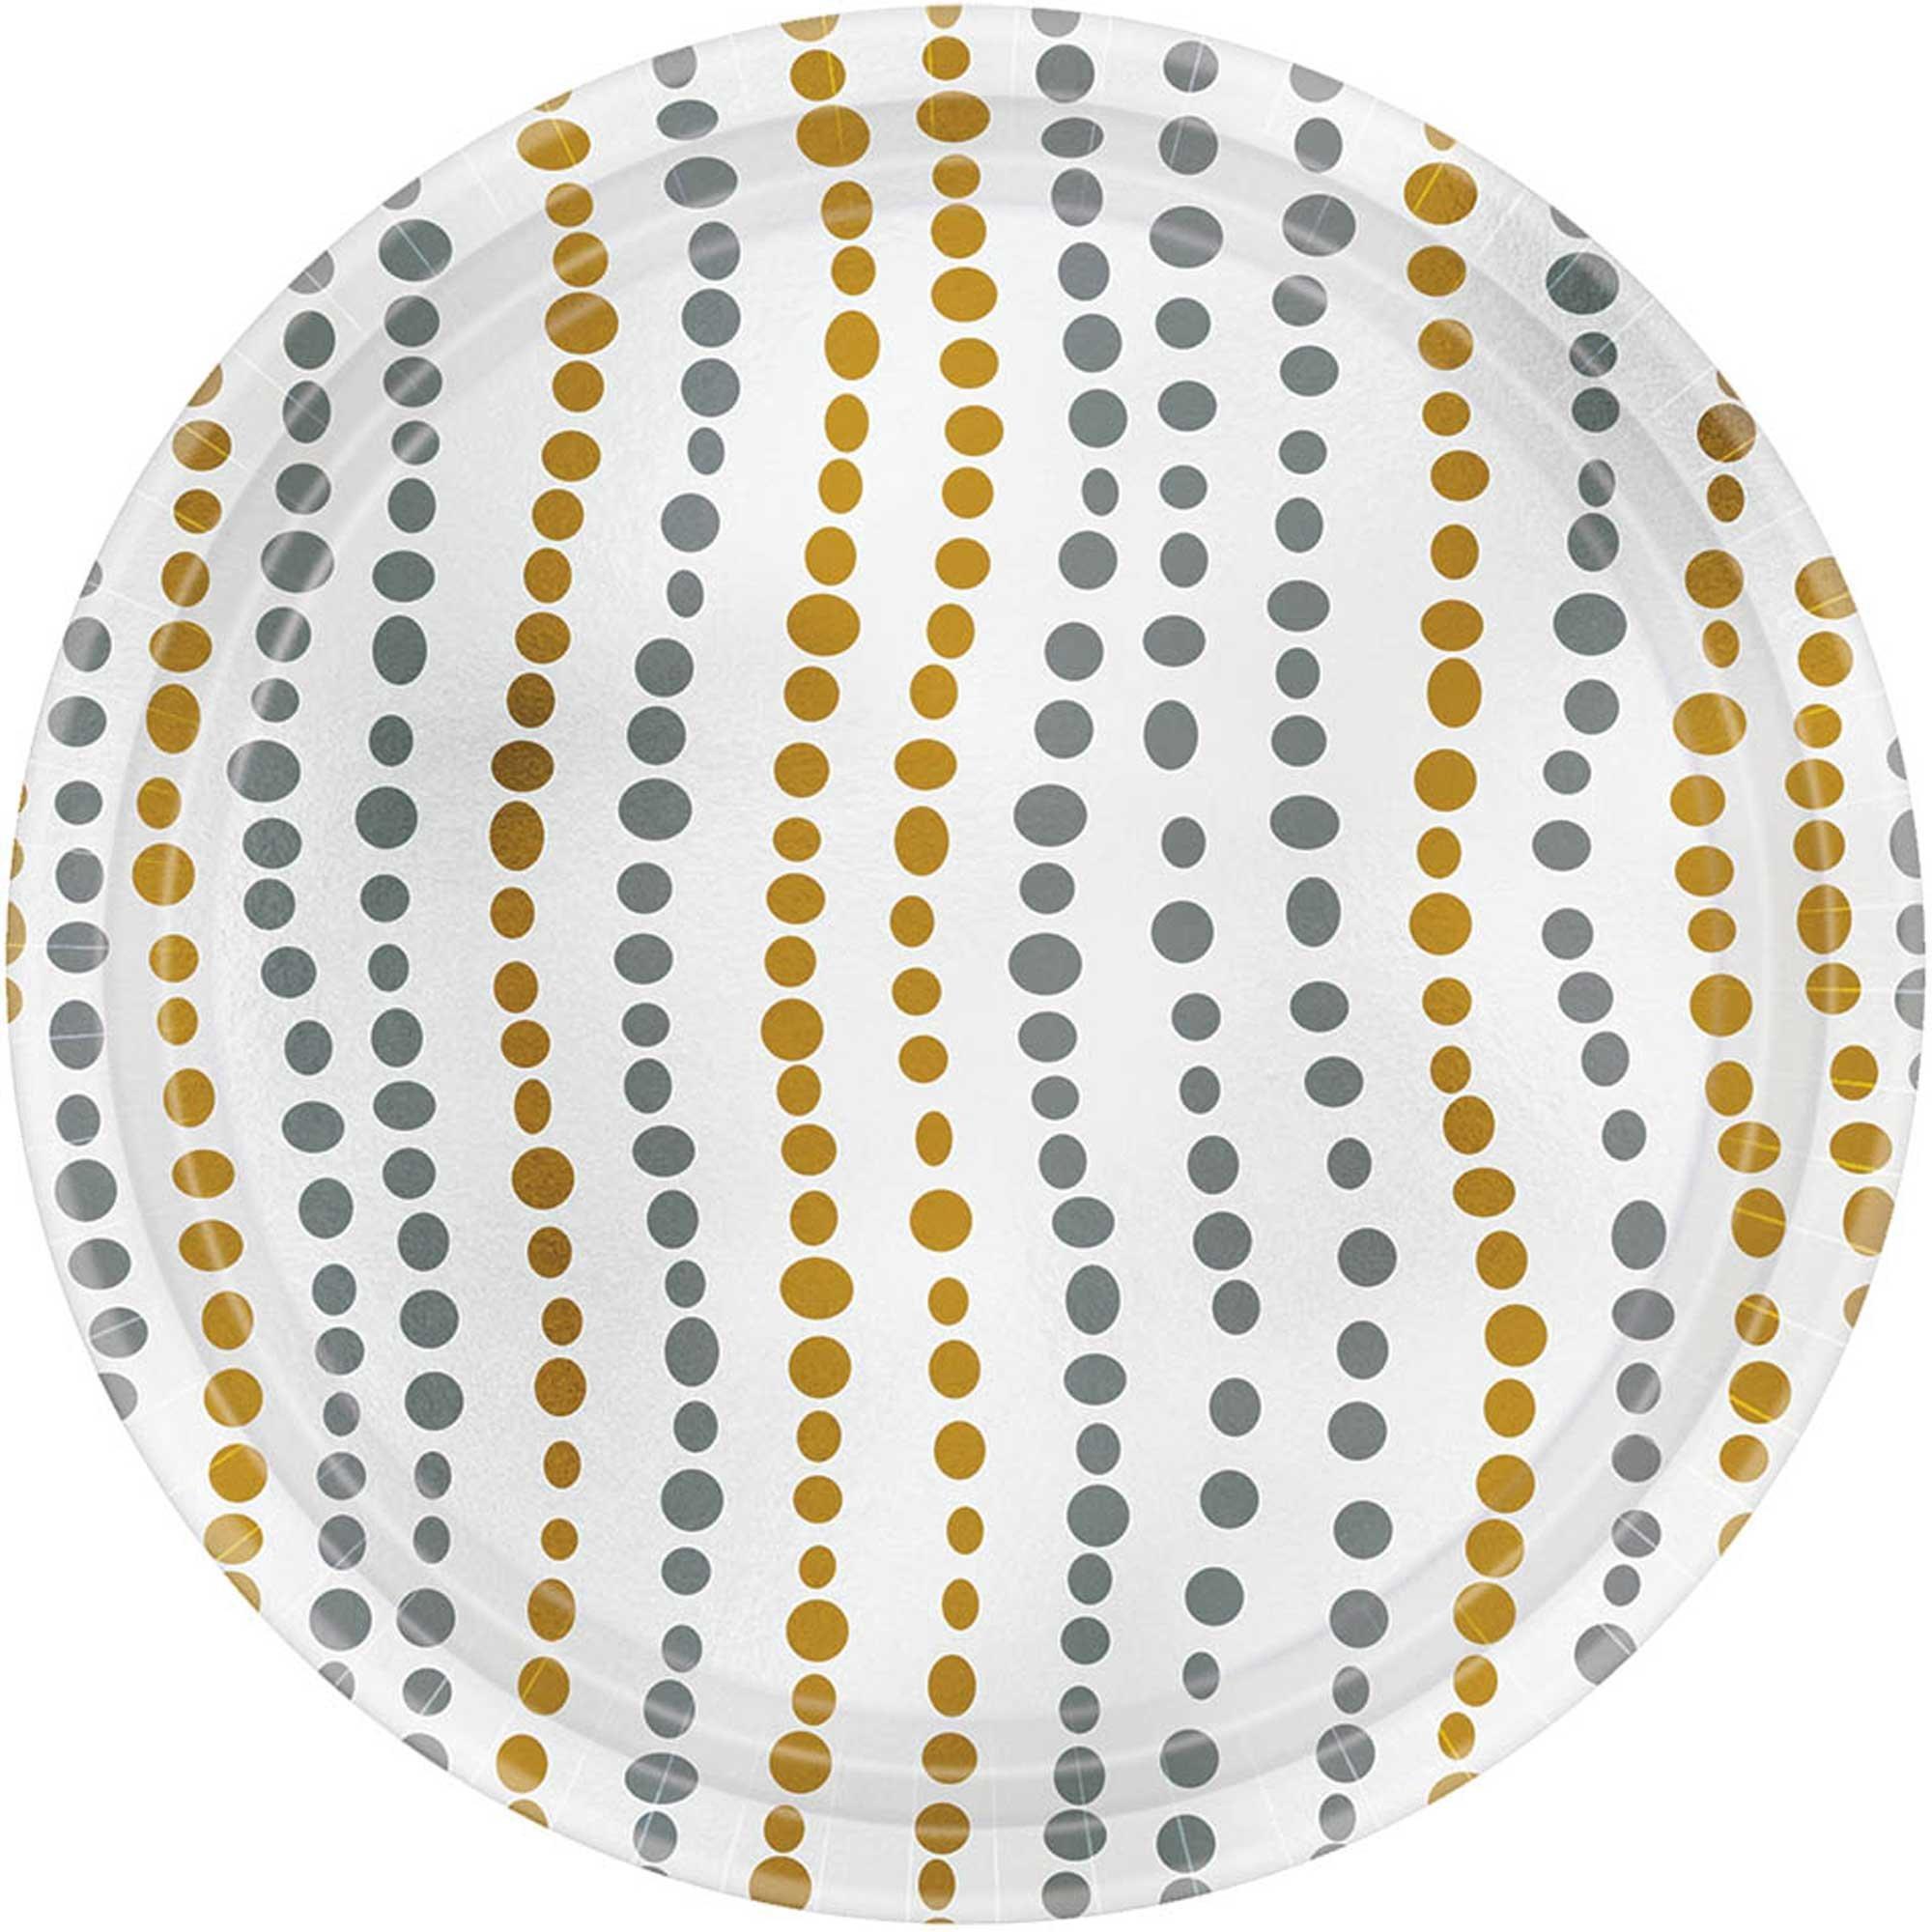 Modern Dot 17cm Paper & Metallic Gold & Silver Round Plates